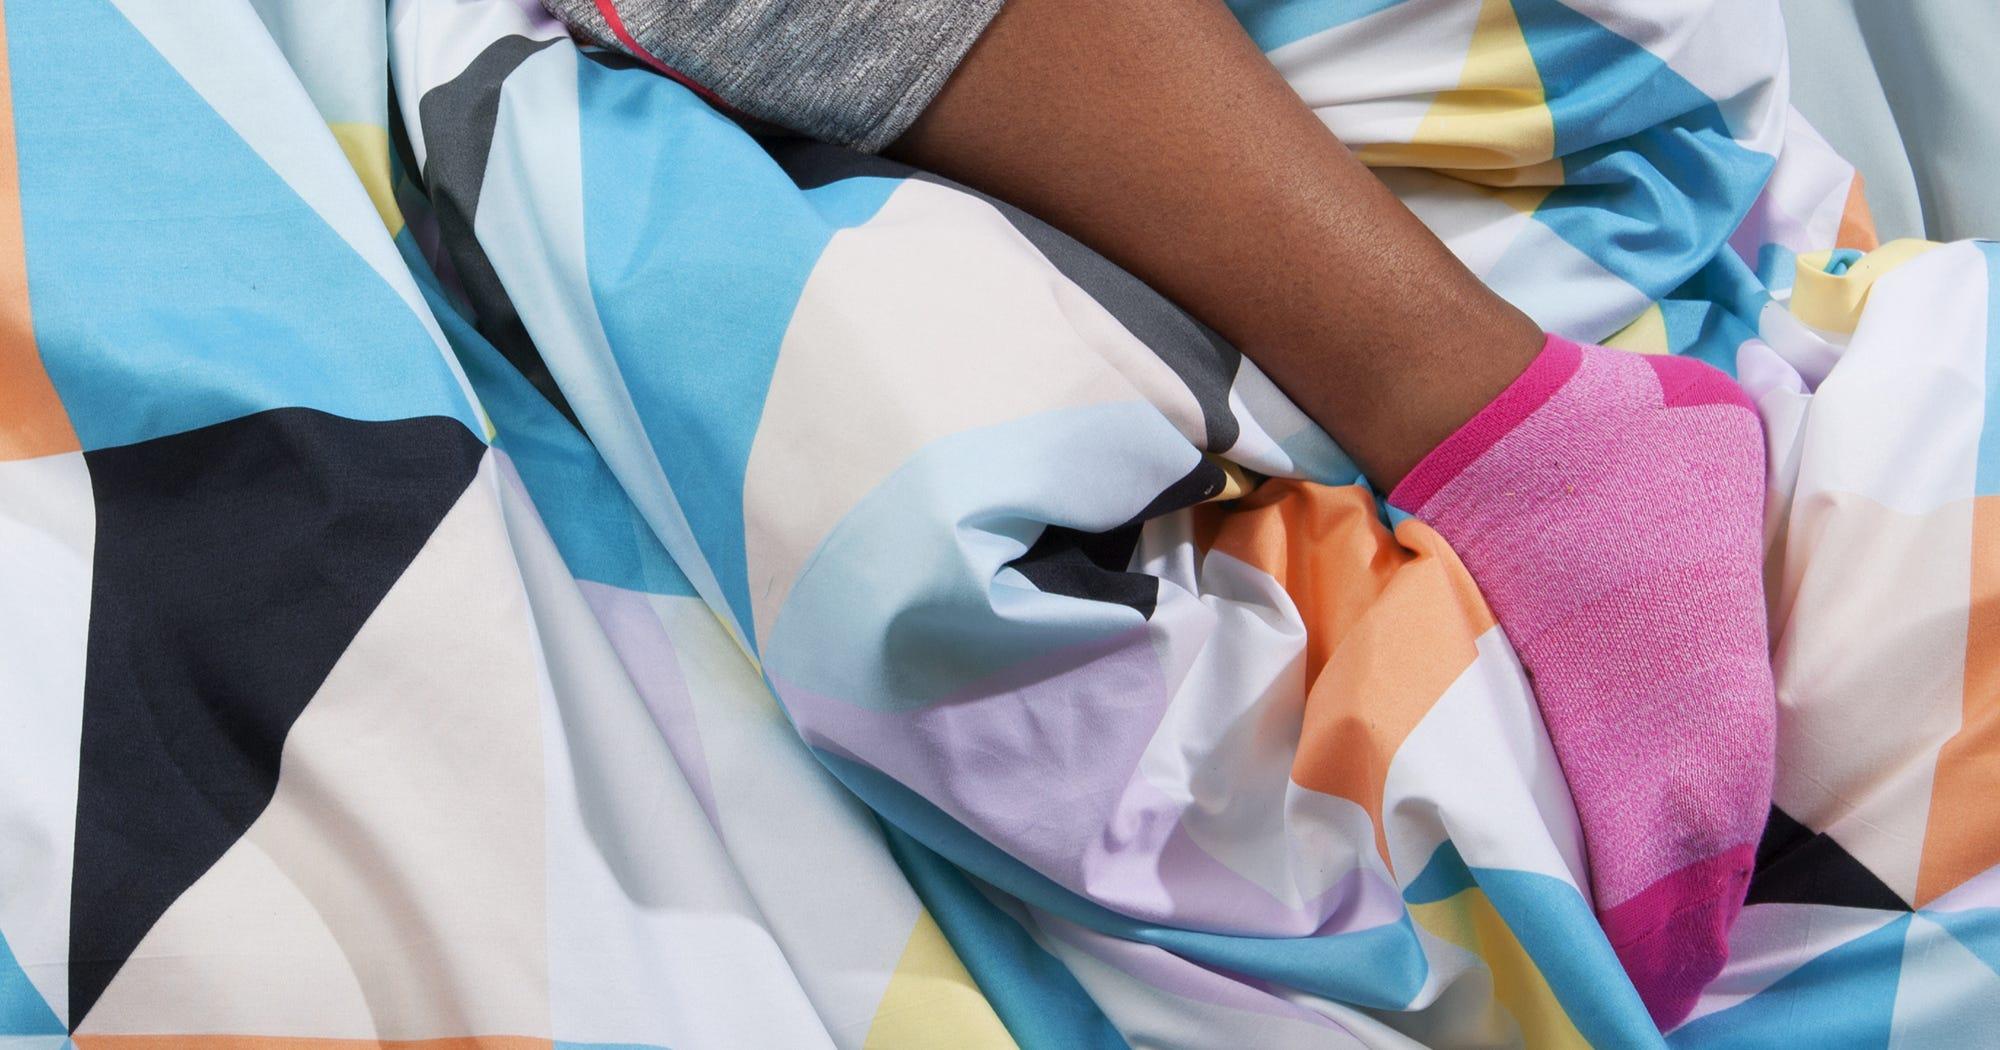 OTC Sleep Aids For Insomnia Antihistamines Side Effects